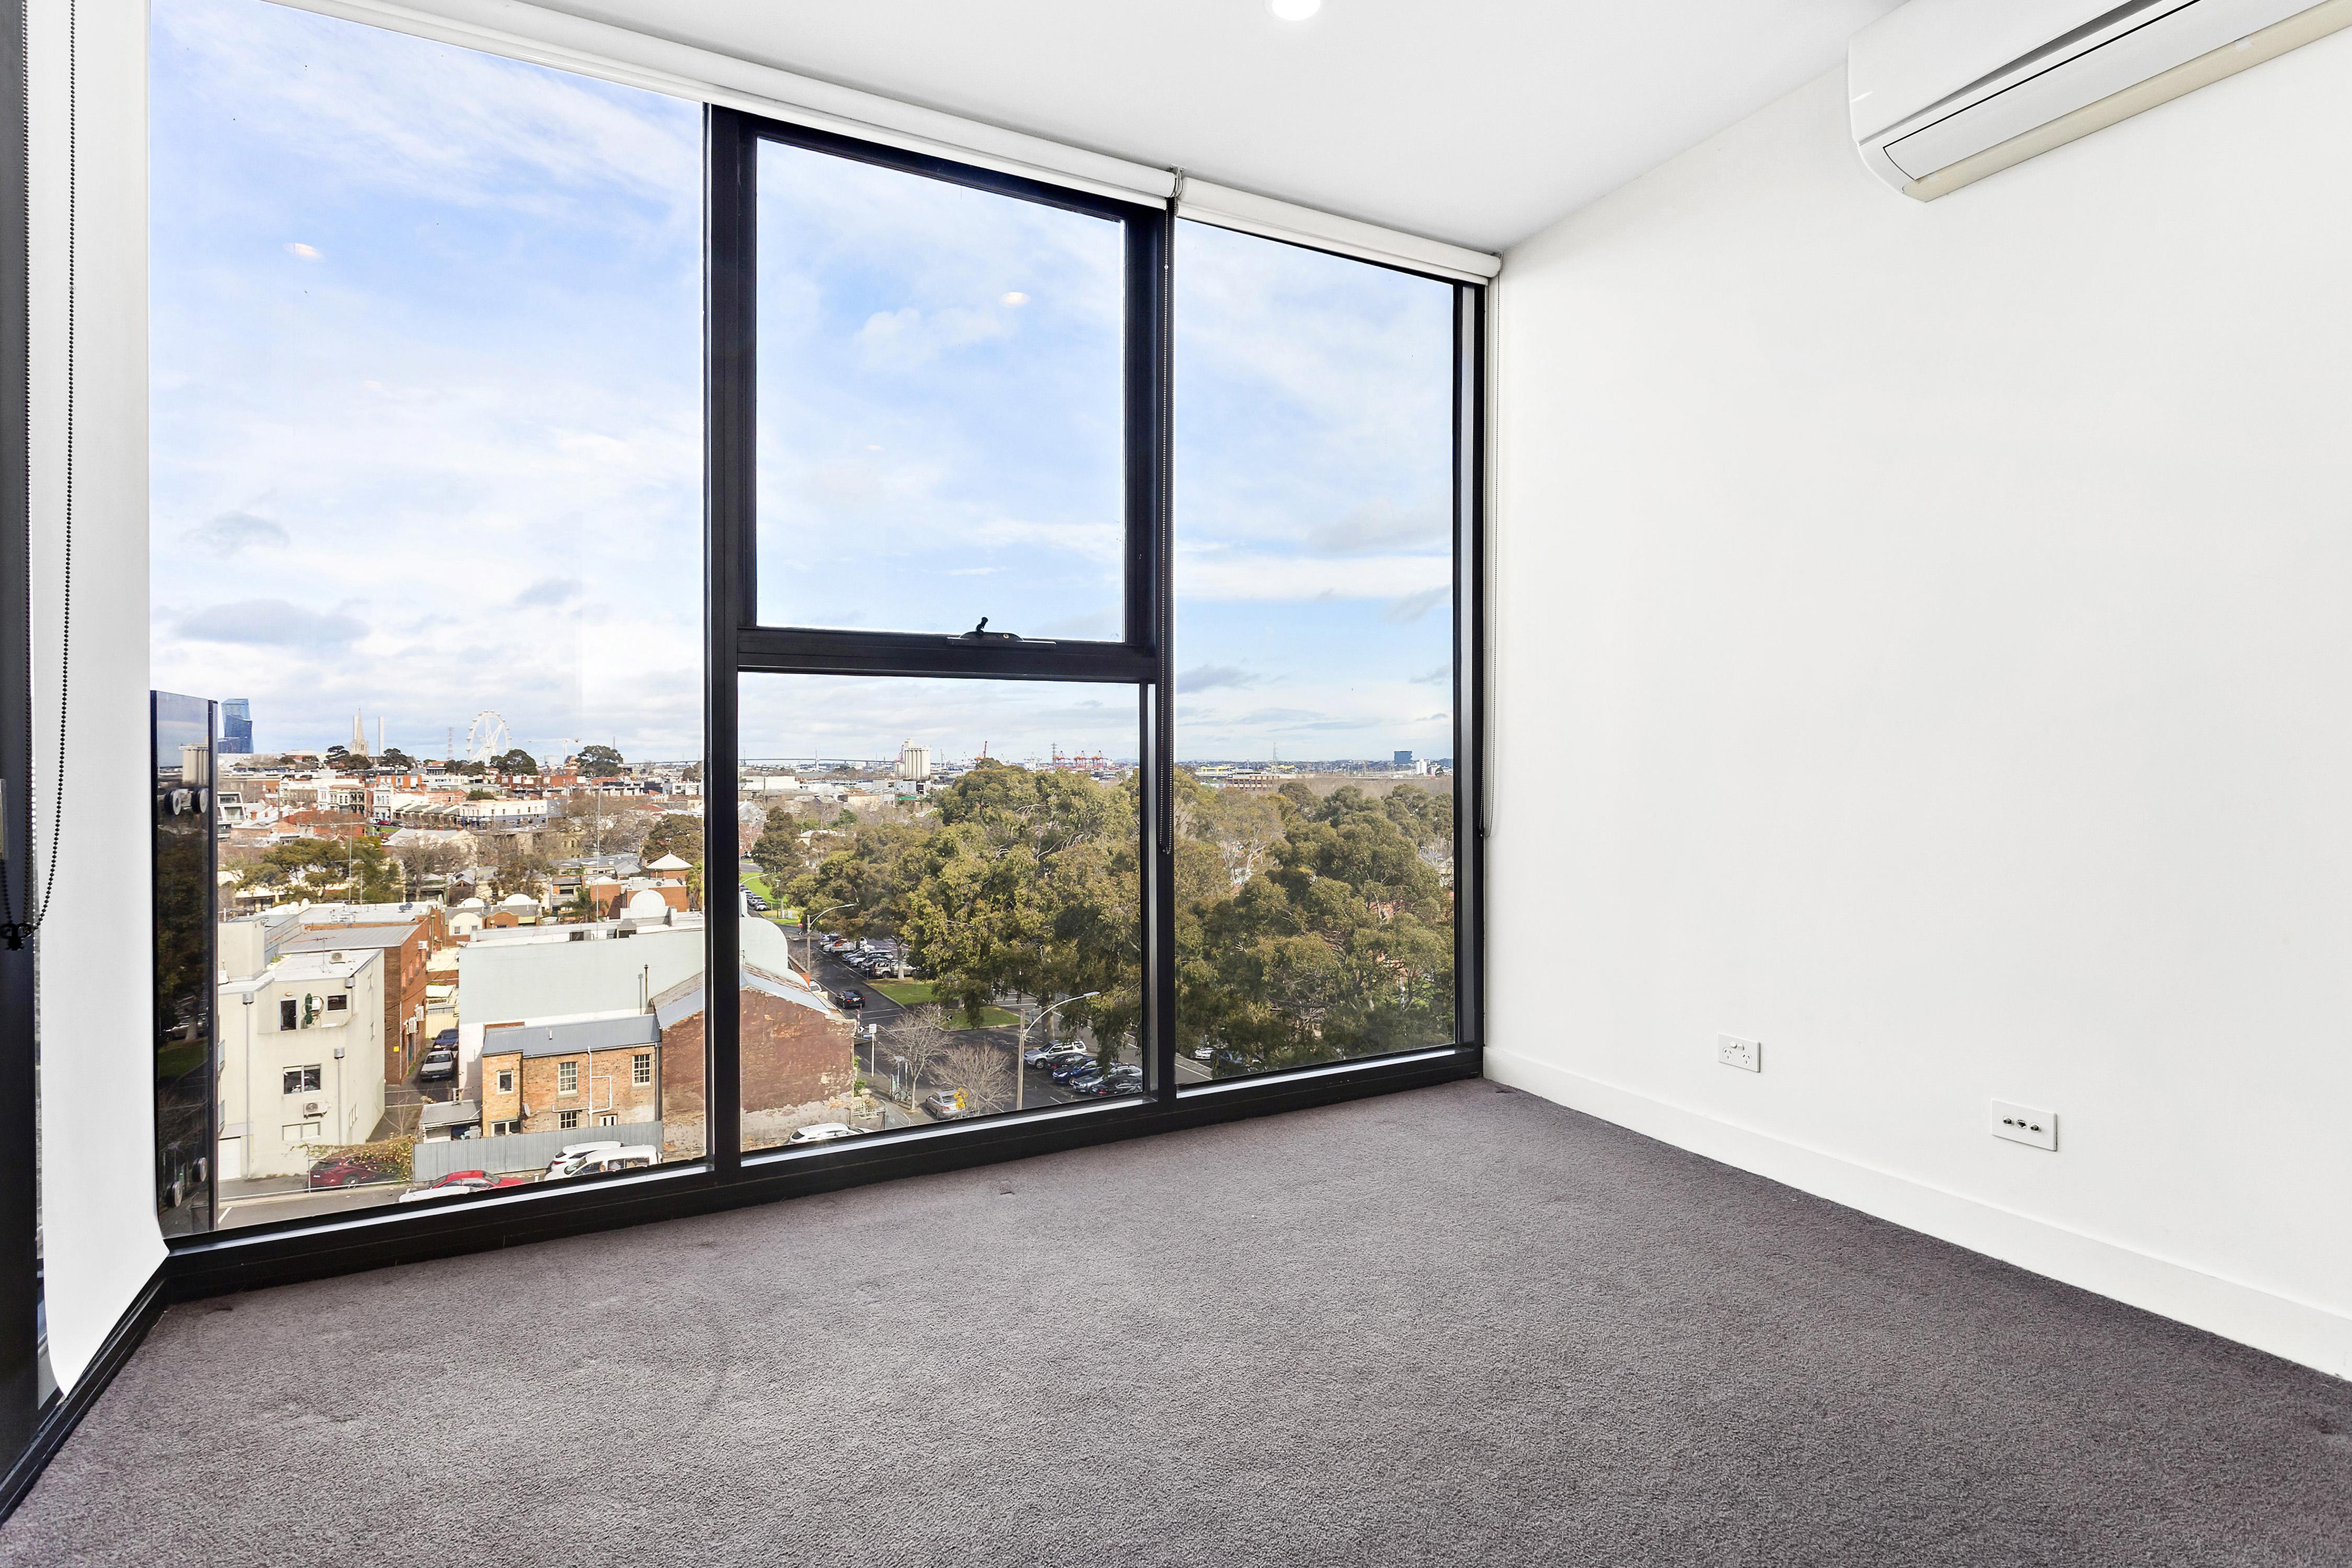 108-97-flemington-road-north-melbourne-student-accommodation-Melbourne-Bedroom-Unilodgers